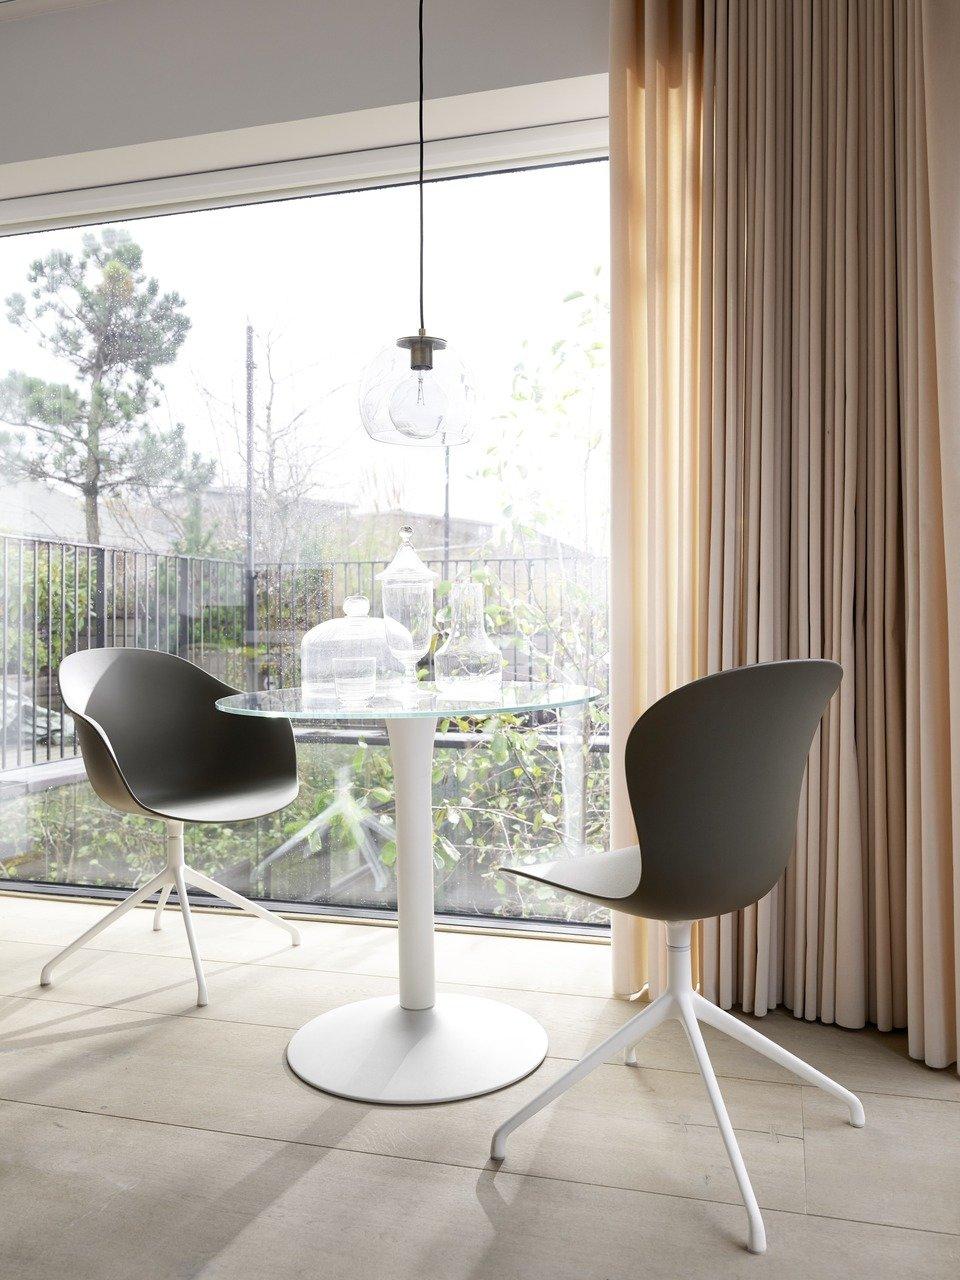 Krzesło Adelaide z funkcją obrotu, cena 1.397,-<br>Krzesło Adelaide z podłokietnikami i funkcją obrotu, cena 1.549,-<br>Stół New York, cena od 2.790,-